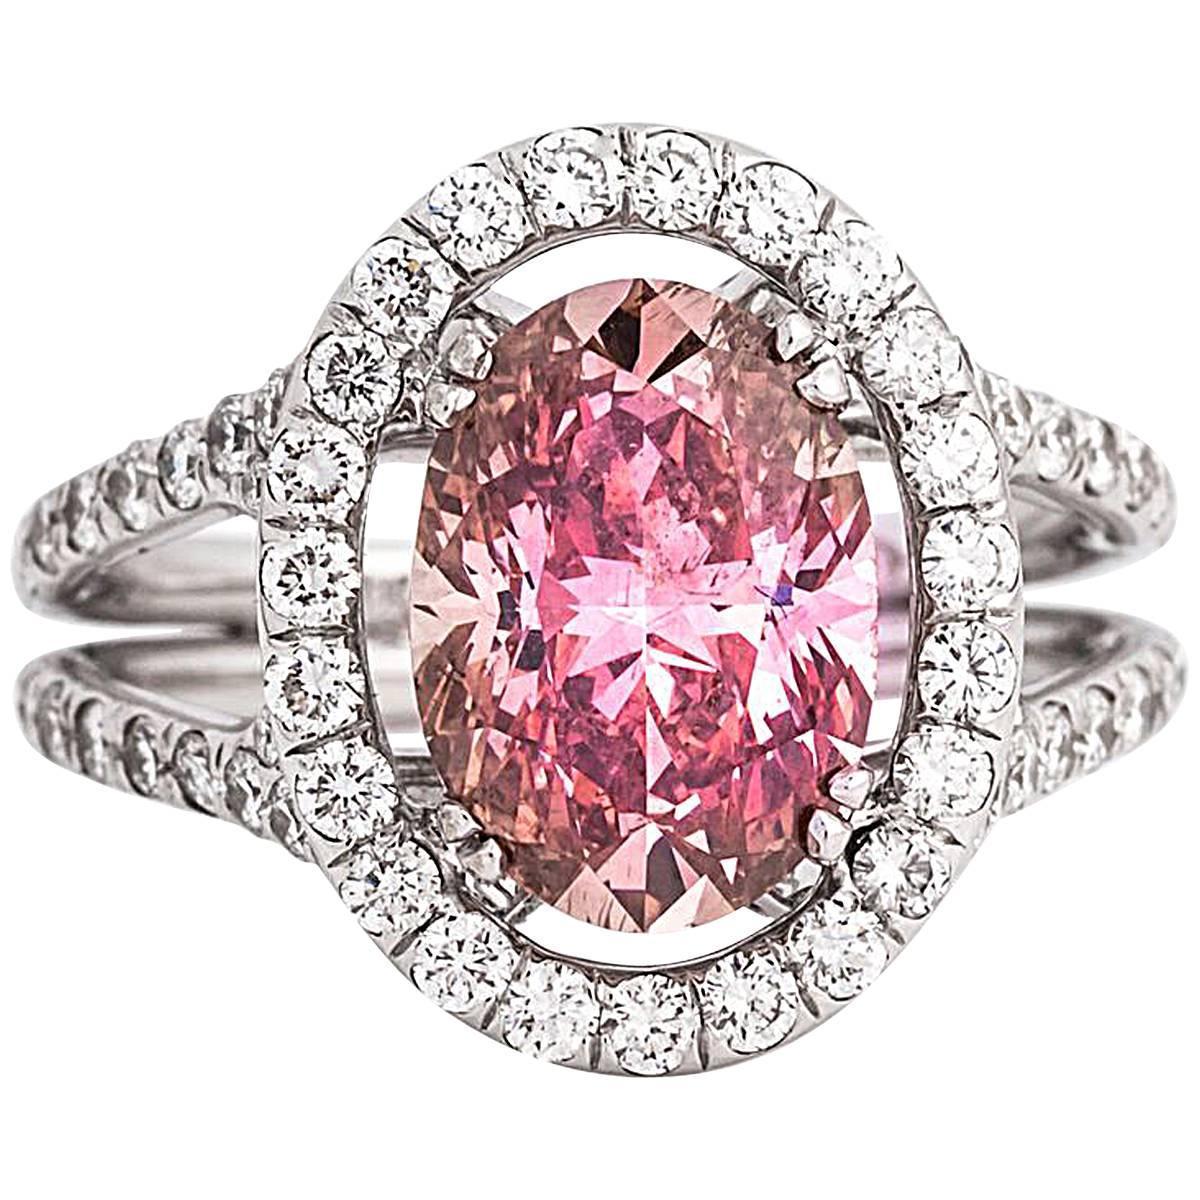 2.25 Carat Fancy Intense Pink Oval Enhanced Diamond White Gold Halo ...